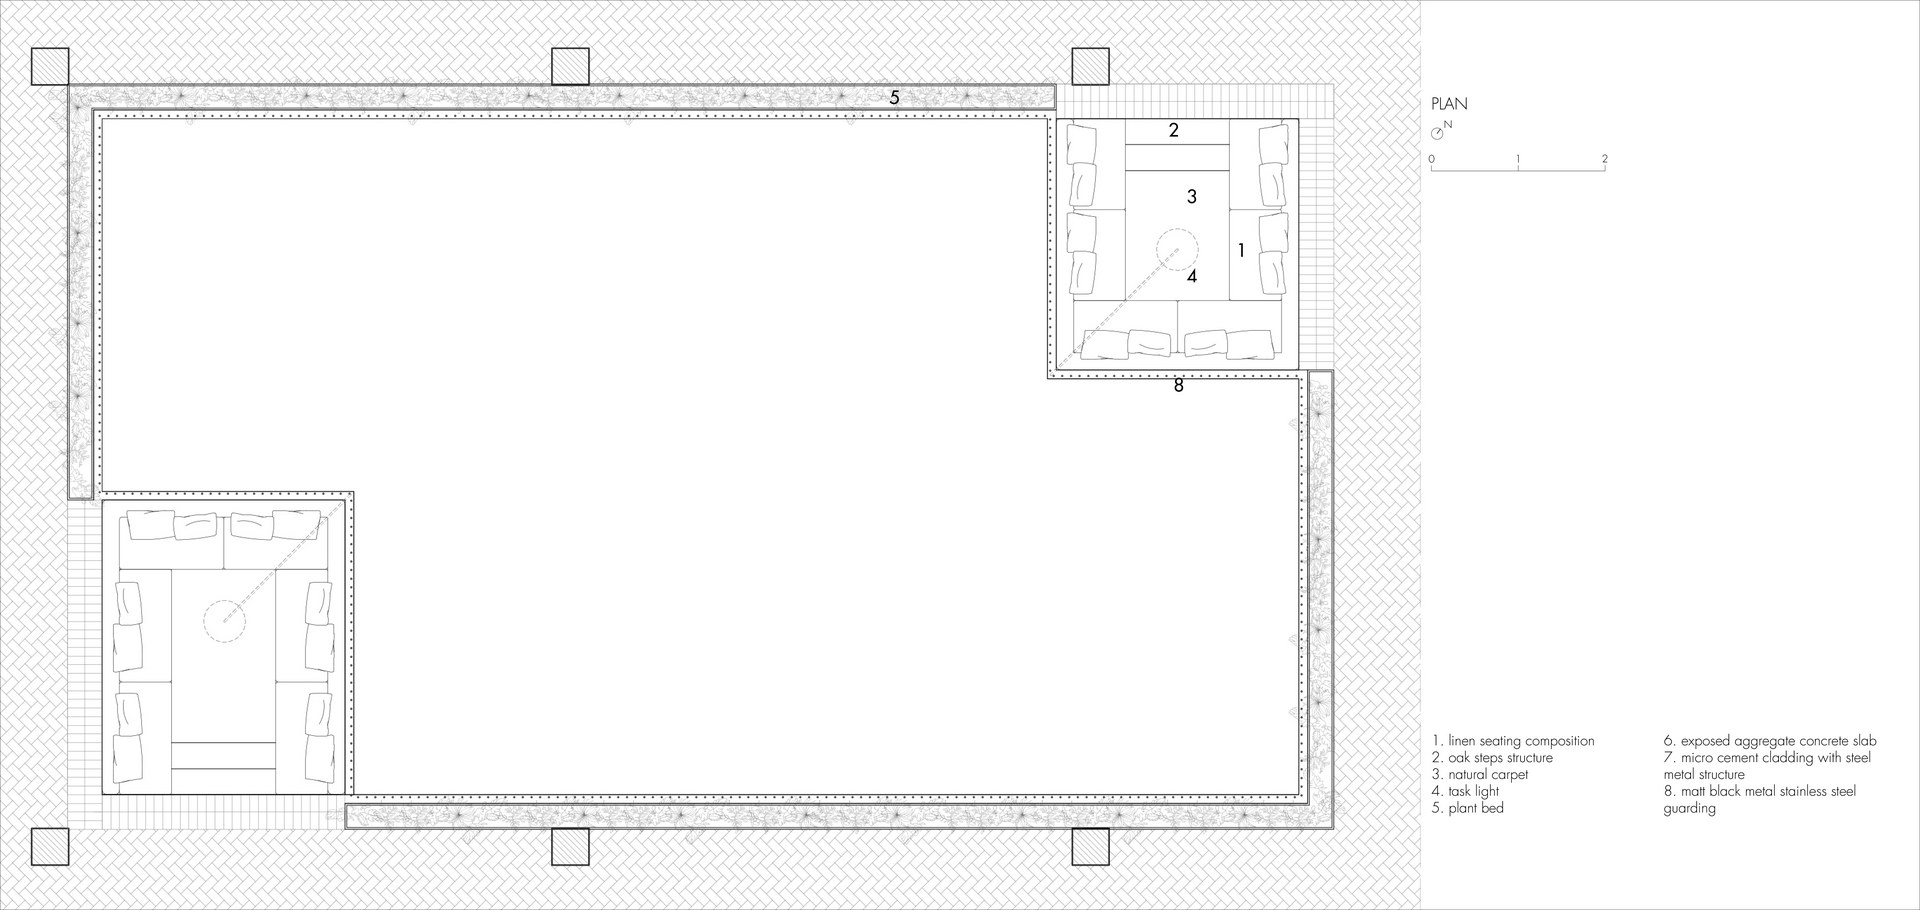 Conversation Pits: Plan | Digital Drawing